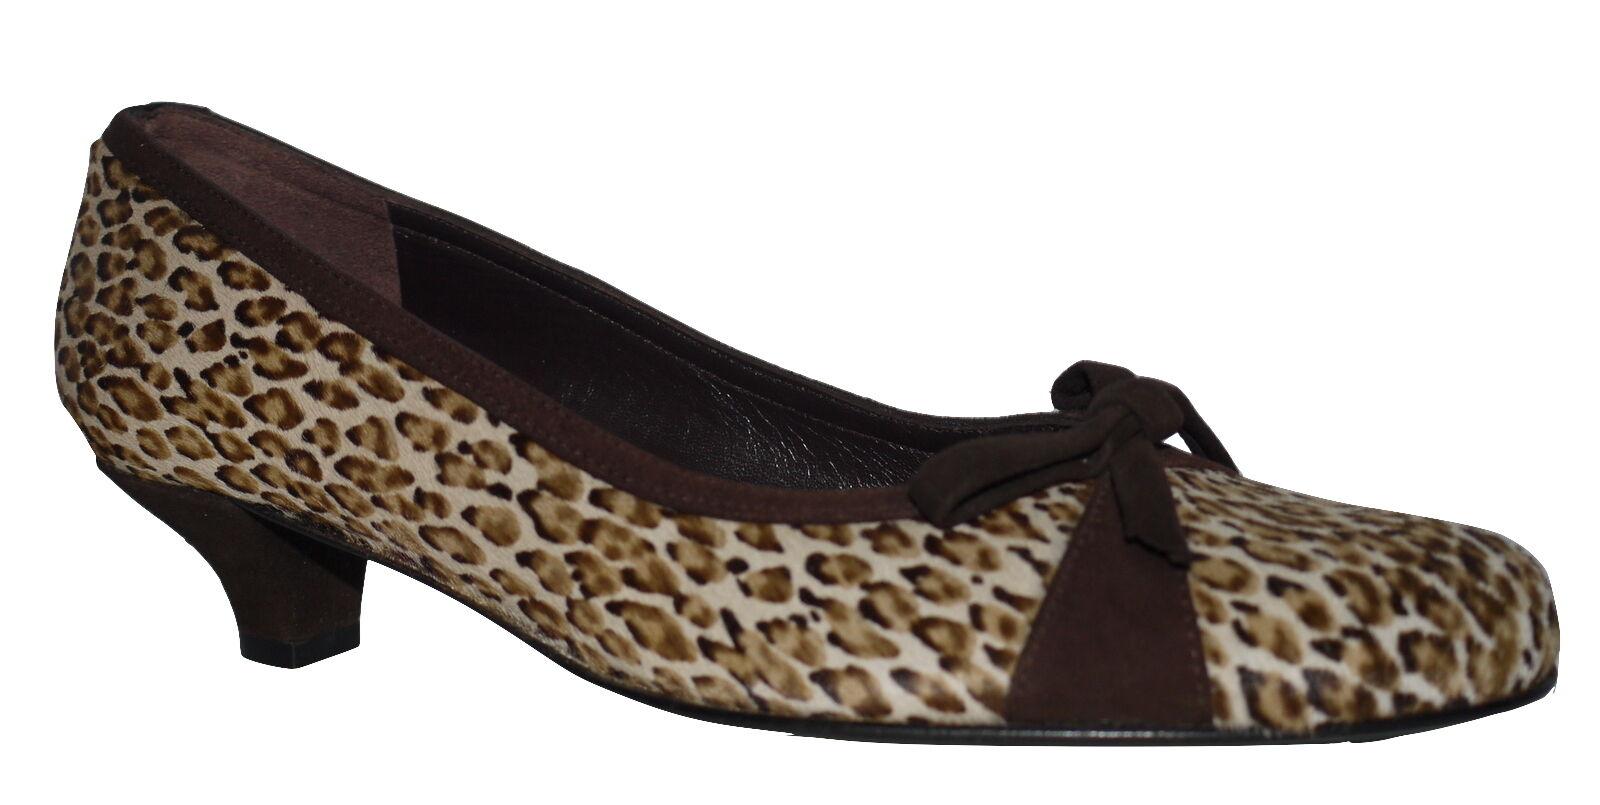 Martinez Valero Pony Schuhes Hide Leopard Print Niedrig Heel Court Schuhes Pony Various Größes NIB ba6a32